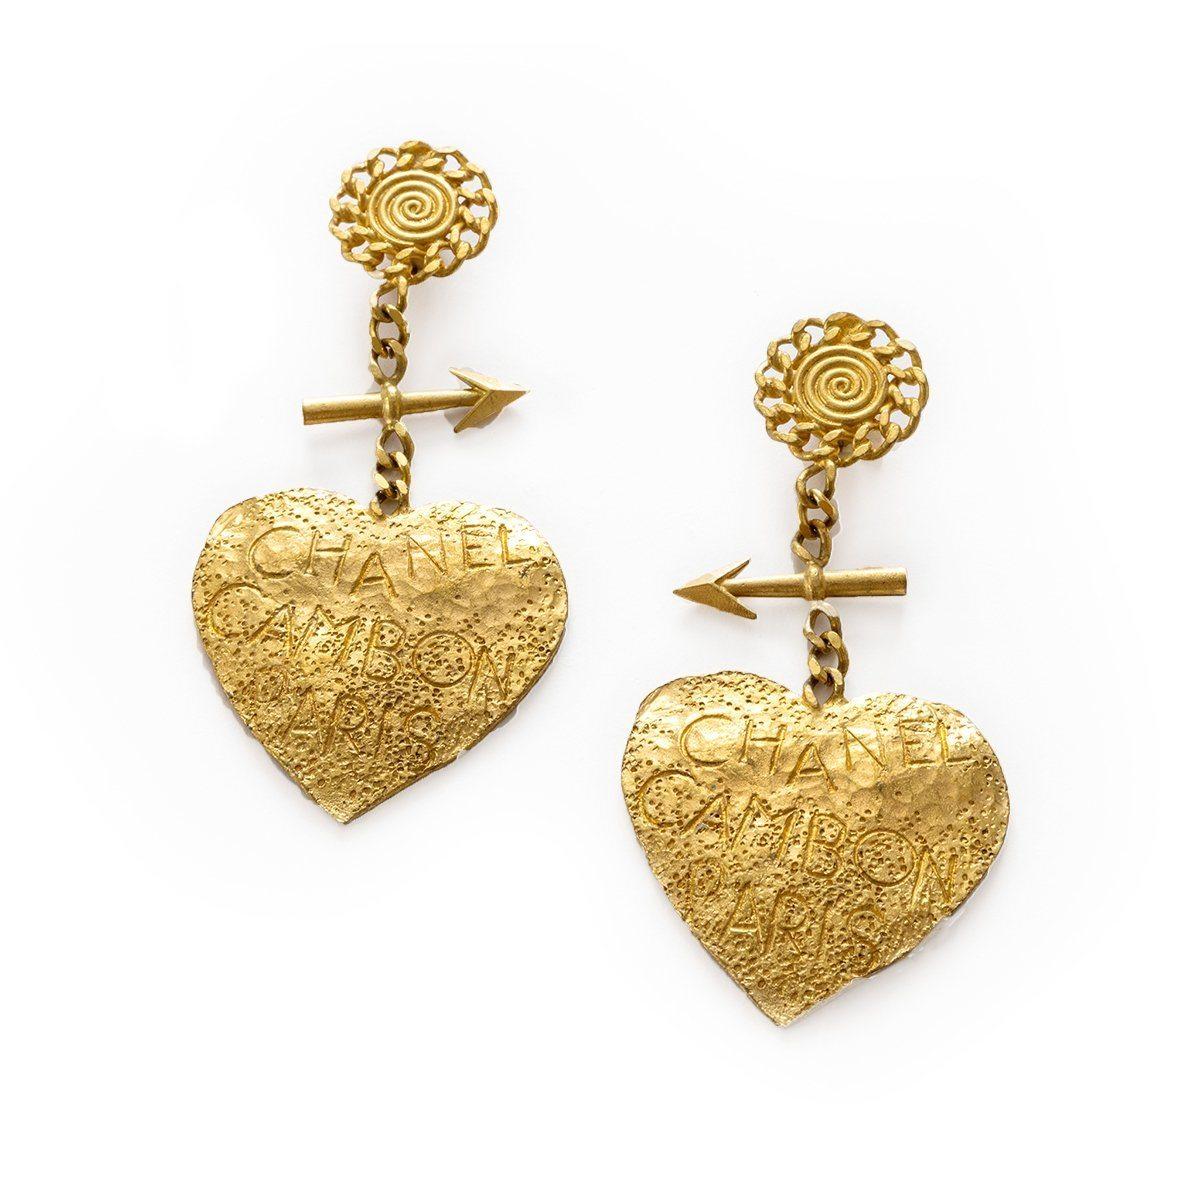 Vintage Chanel Cambon Paris Graffiti Heart Earrings